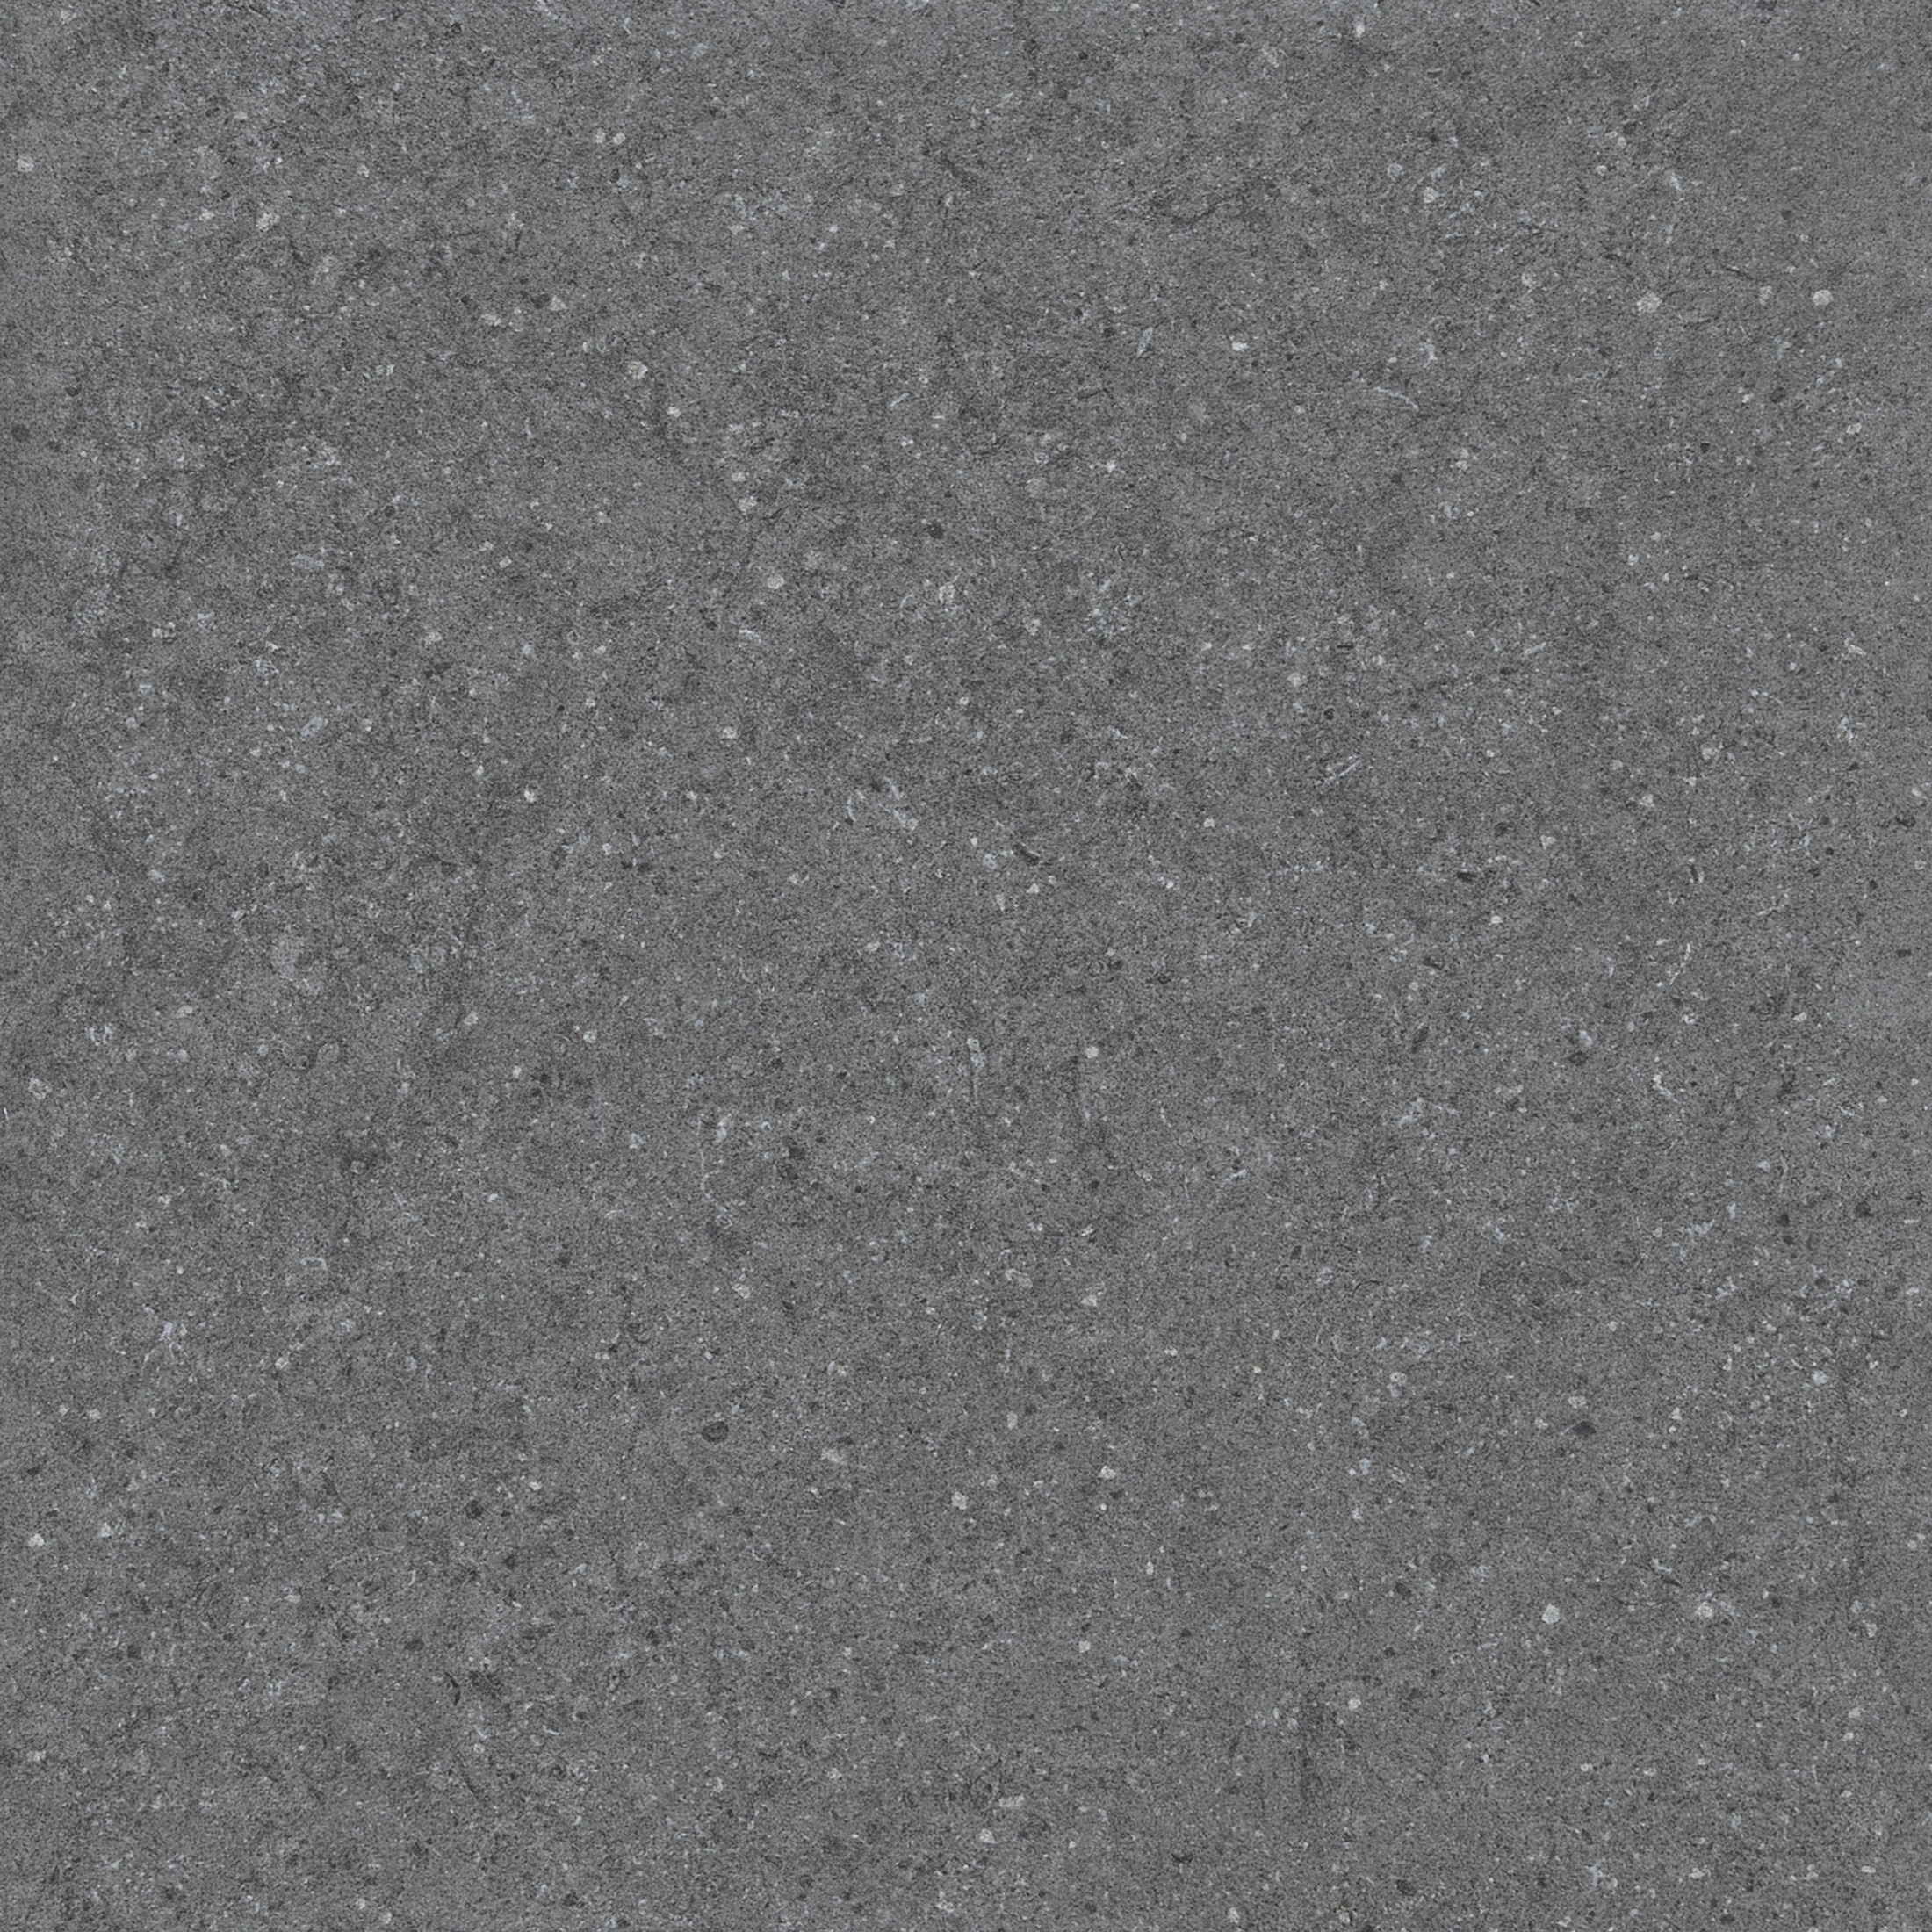 V1303/1304 Skyport Antracite